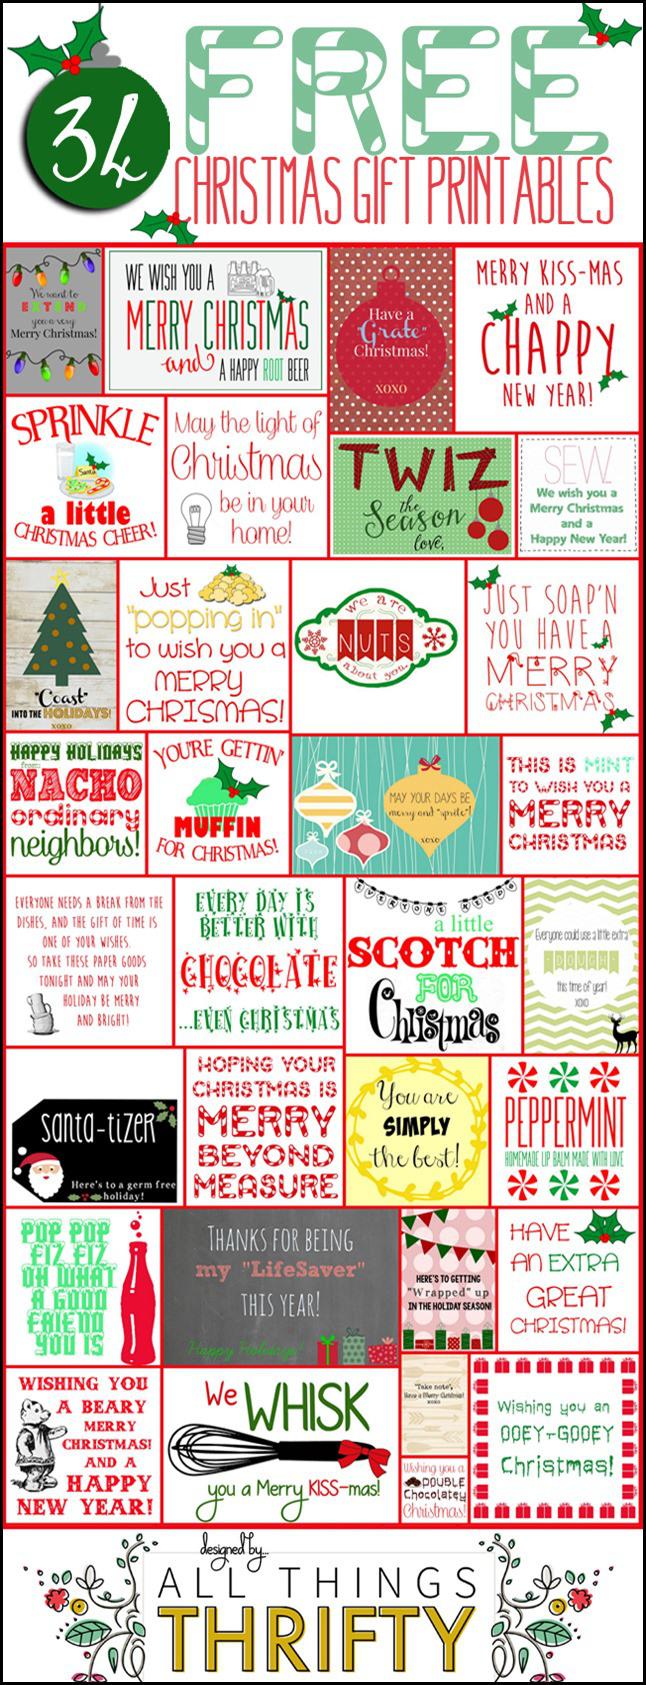 HAPPY Holidays: 34 Free Christmas Gift Tag Printables - Tatertots and Jello